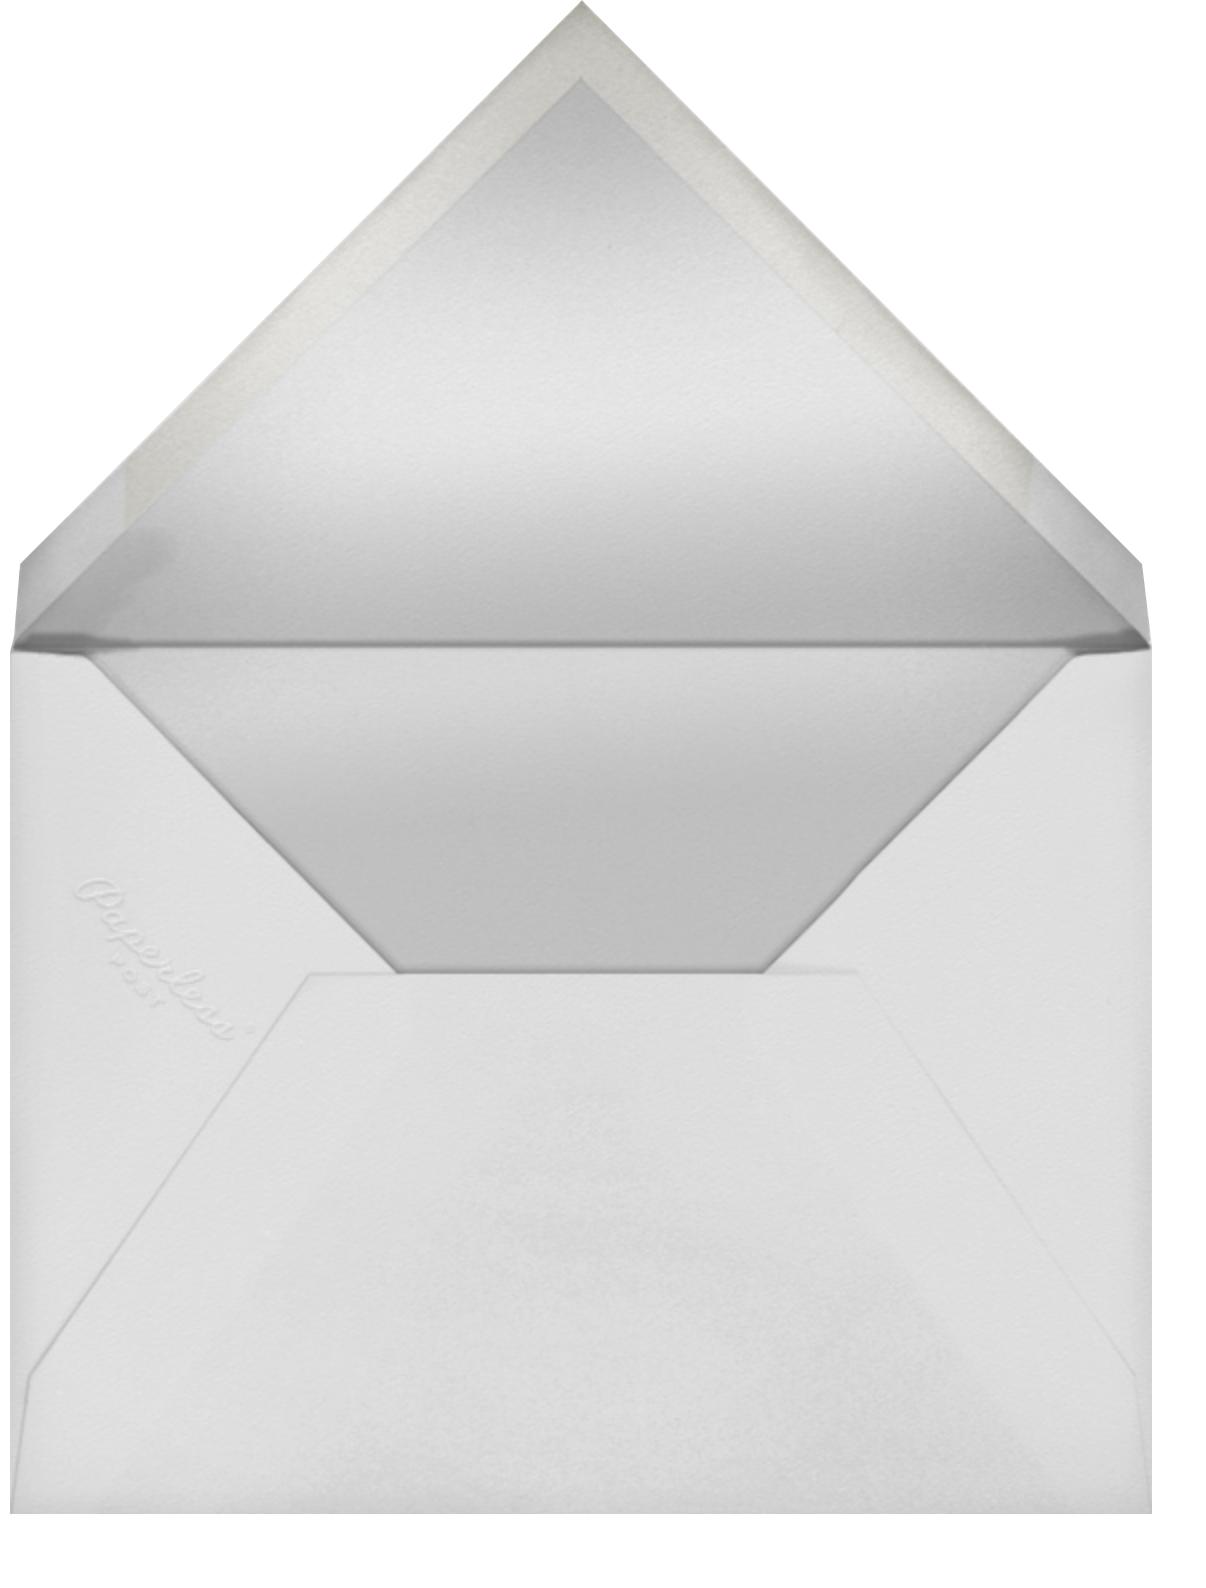 Emblem (Program) - Navy - Bernard Maisner - Menus and programs - envelope back